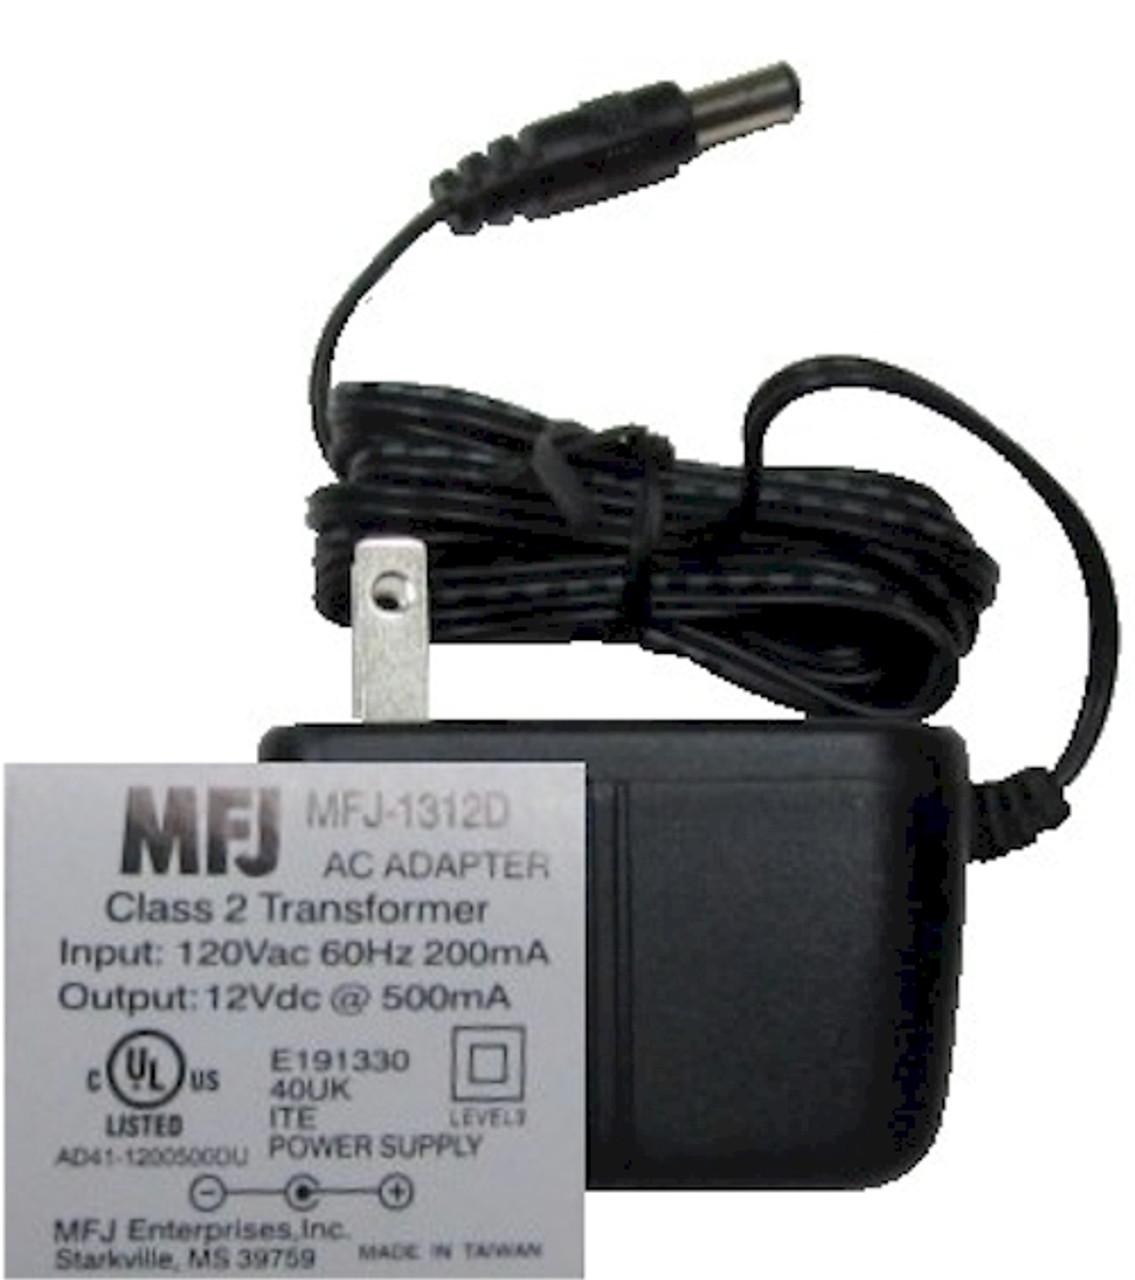 MFJ-1312D, POWER SUPPLY, AC ADAPTOR, 12 VDC, 500 MA